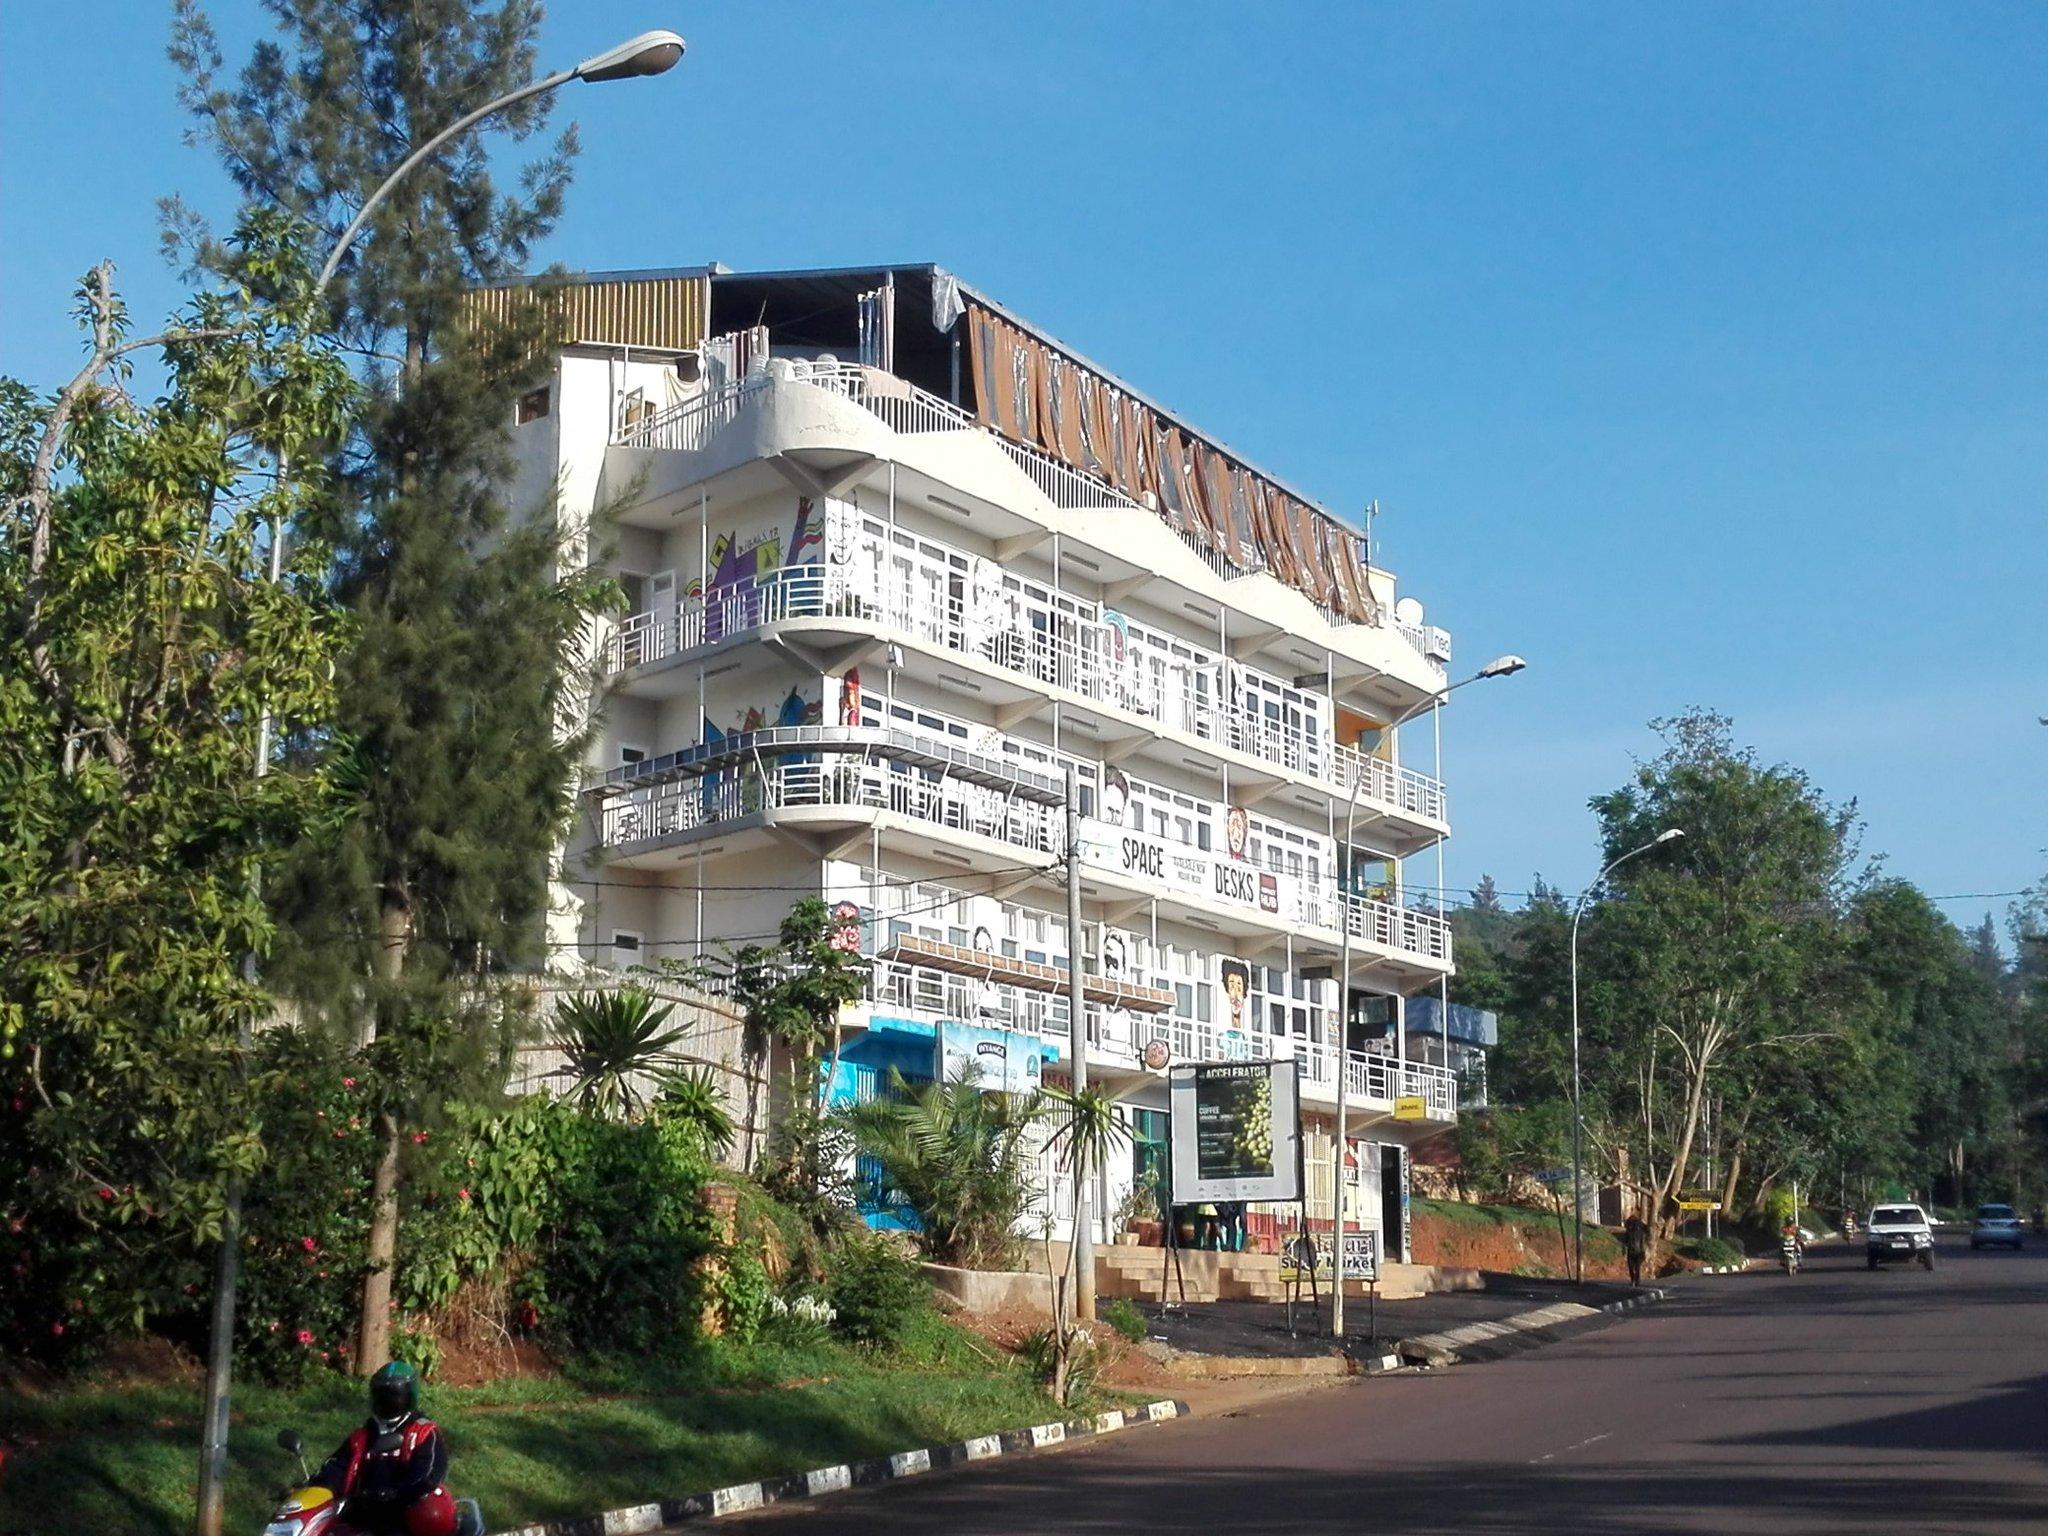 @impacthub Kigali wakes up to a beautiful morning after a most successful @gisday and #RwOT. @esrirwanda https://t.co/FEUgTAJkVt